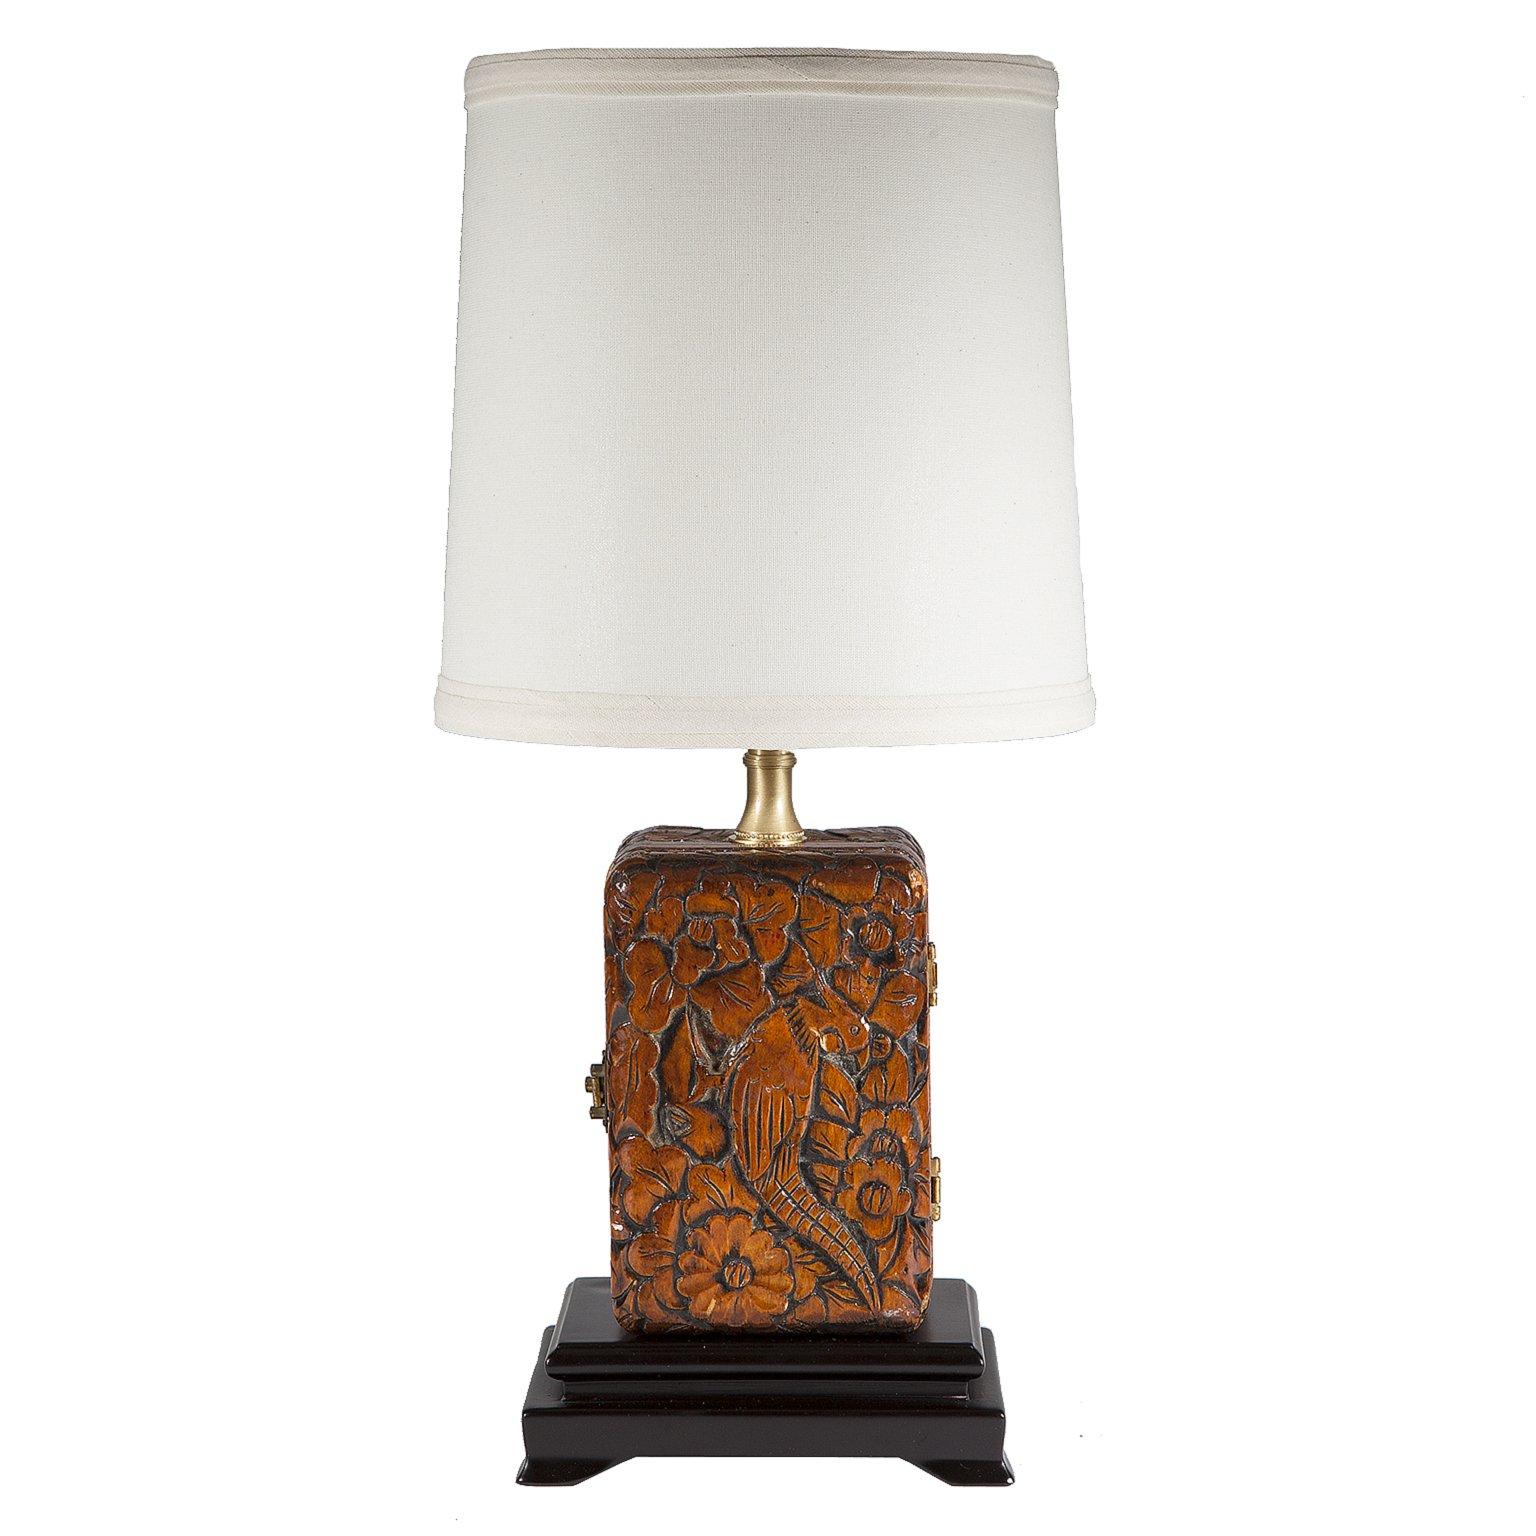 Vintage Carved Wood Box Table Lamp